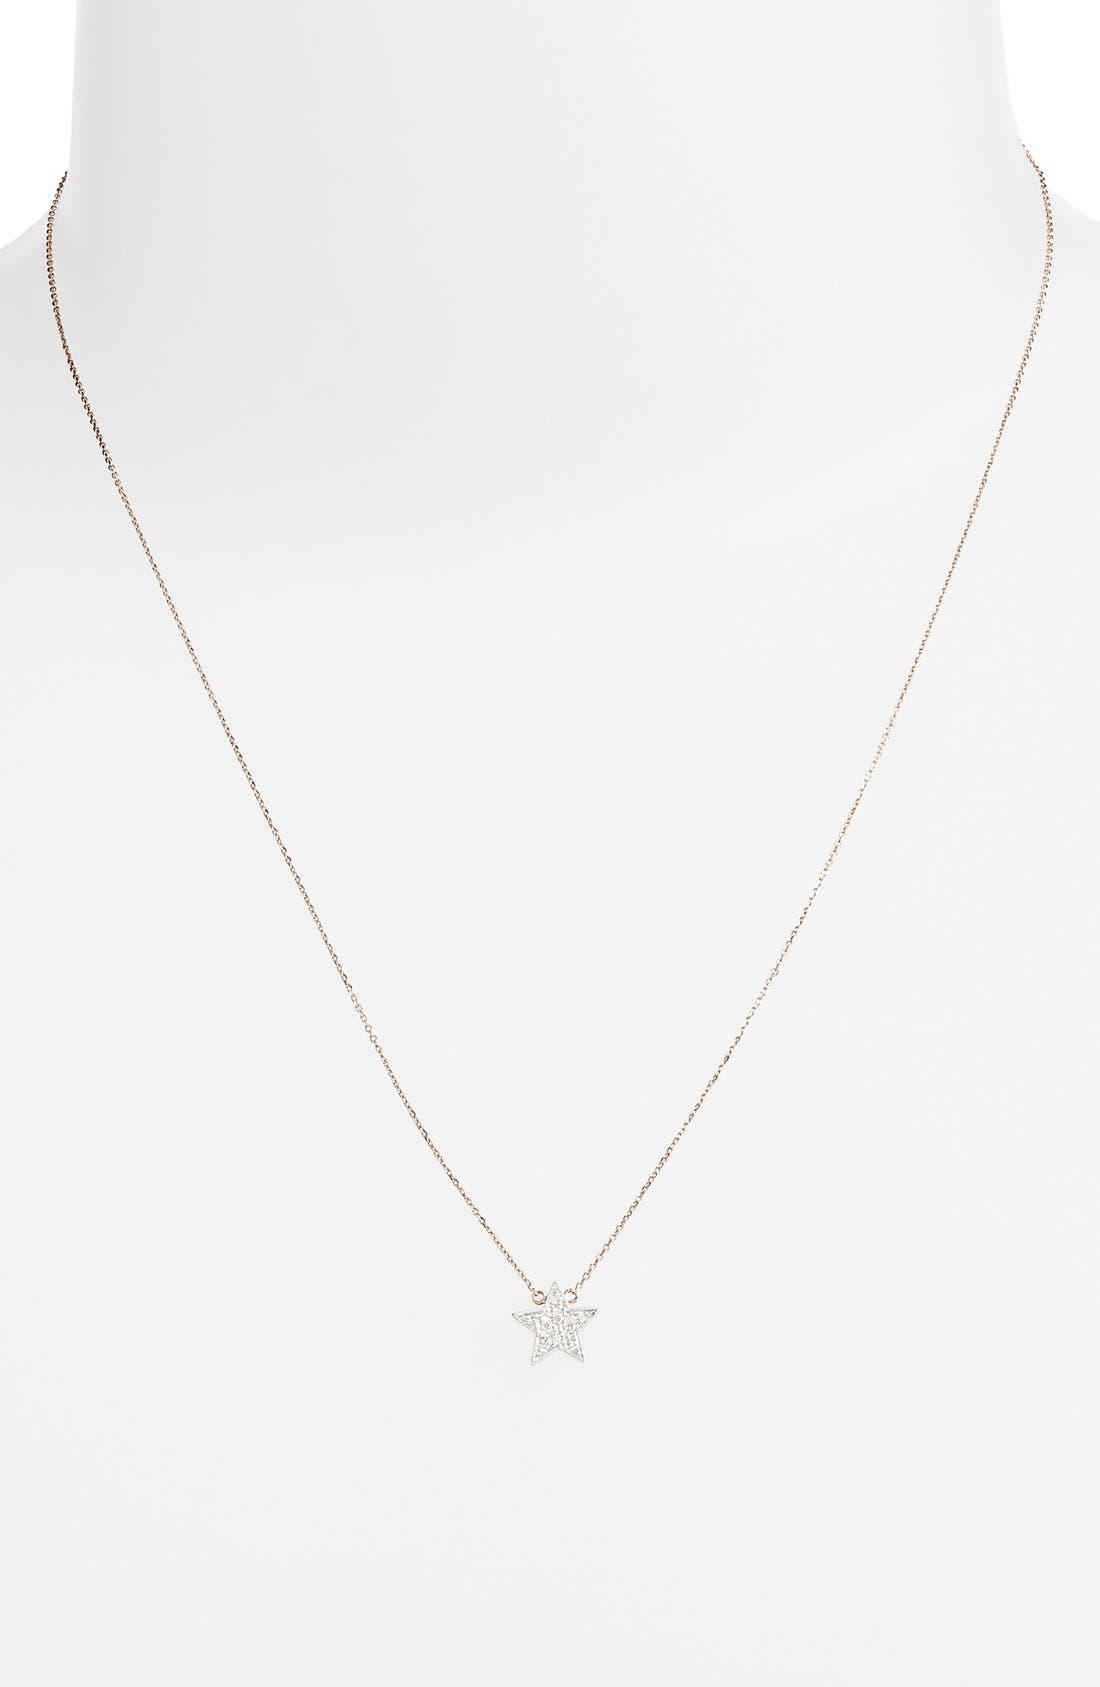 'Julianne Himiko' Diamond Star Pendant Necklace,                             Alternate thumbnail 2, color,                             Rose Gold/ White Gold